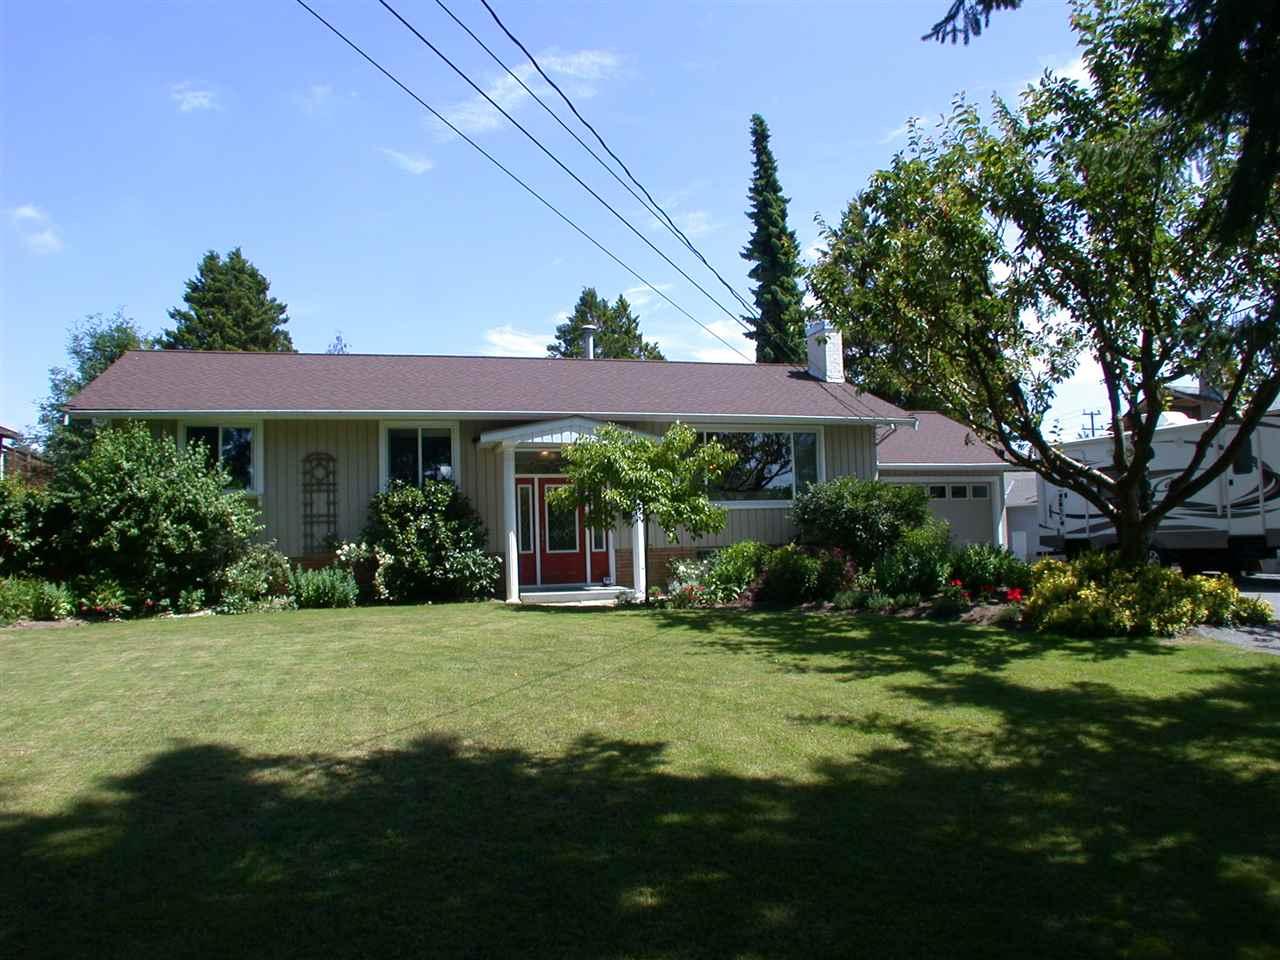 Detached at 12040 206 STREET, Maple Ridge, British Columbia. Image 1